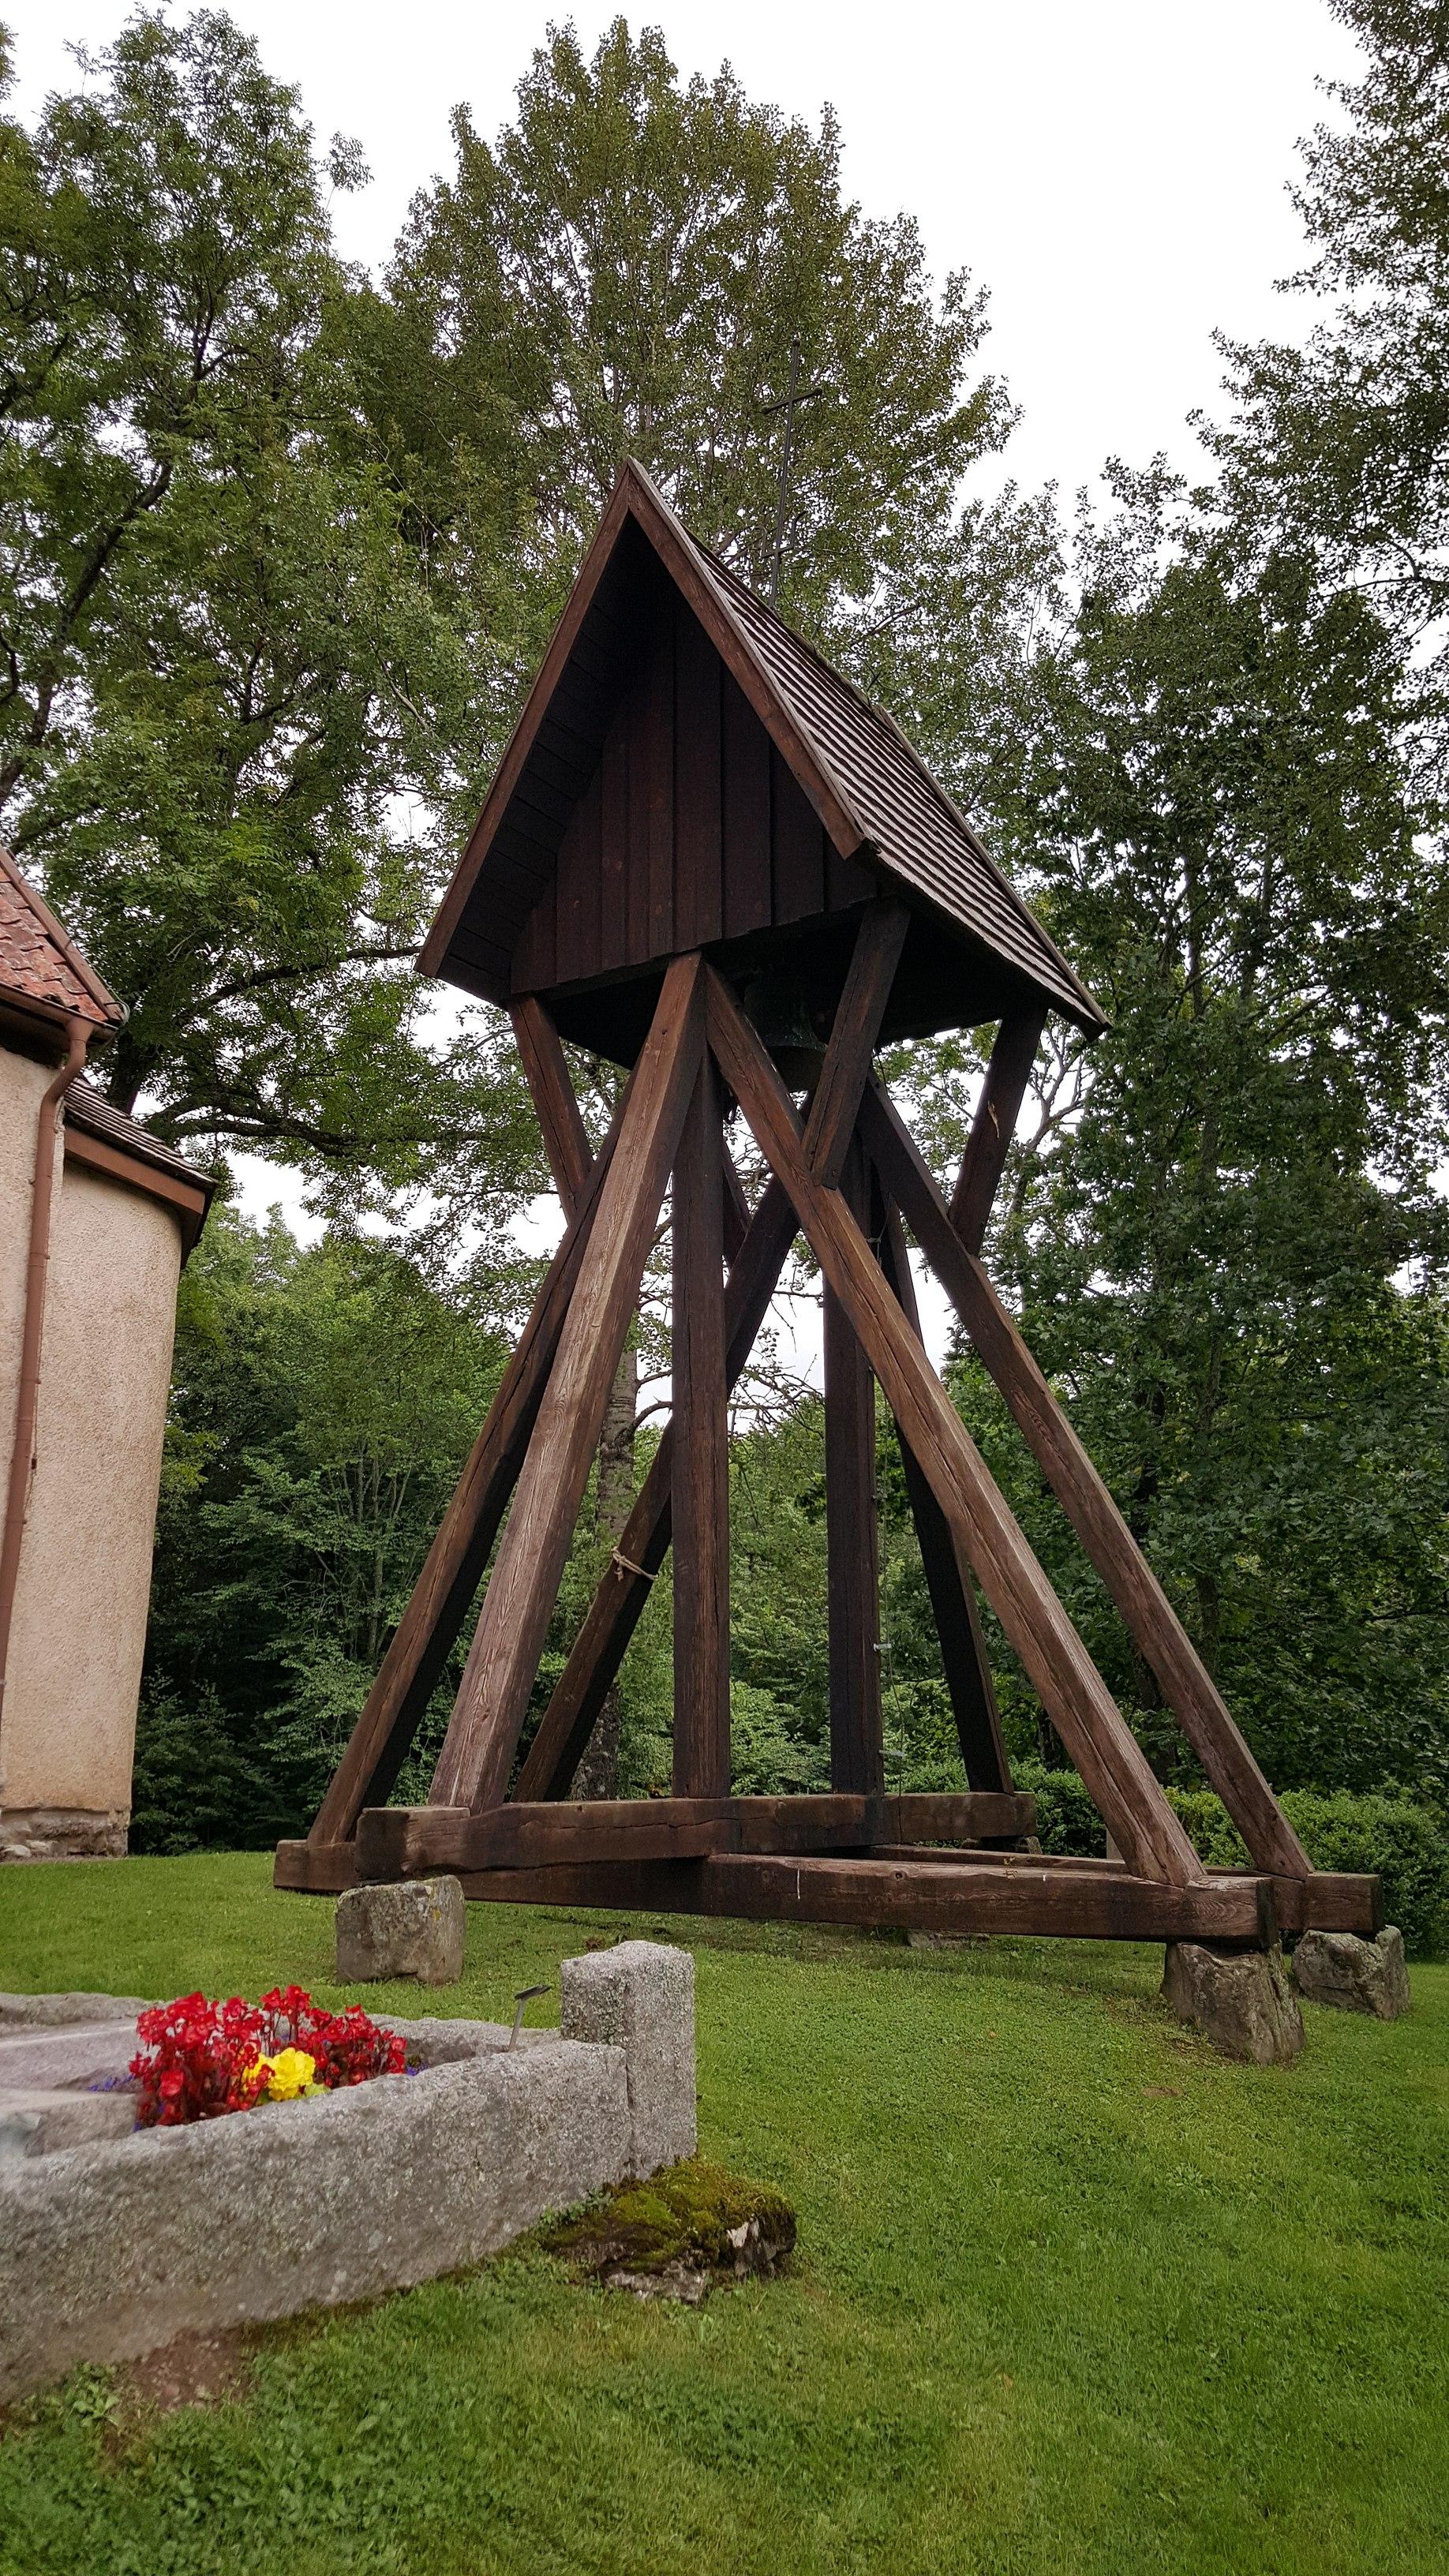 File:Norra Kyrketorps gamla kyrka unam.net - Wikimedia Commons